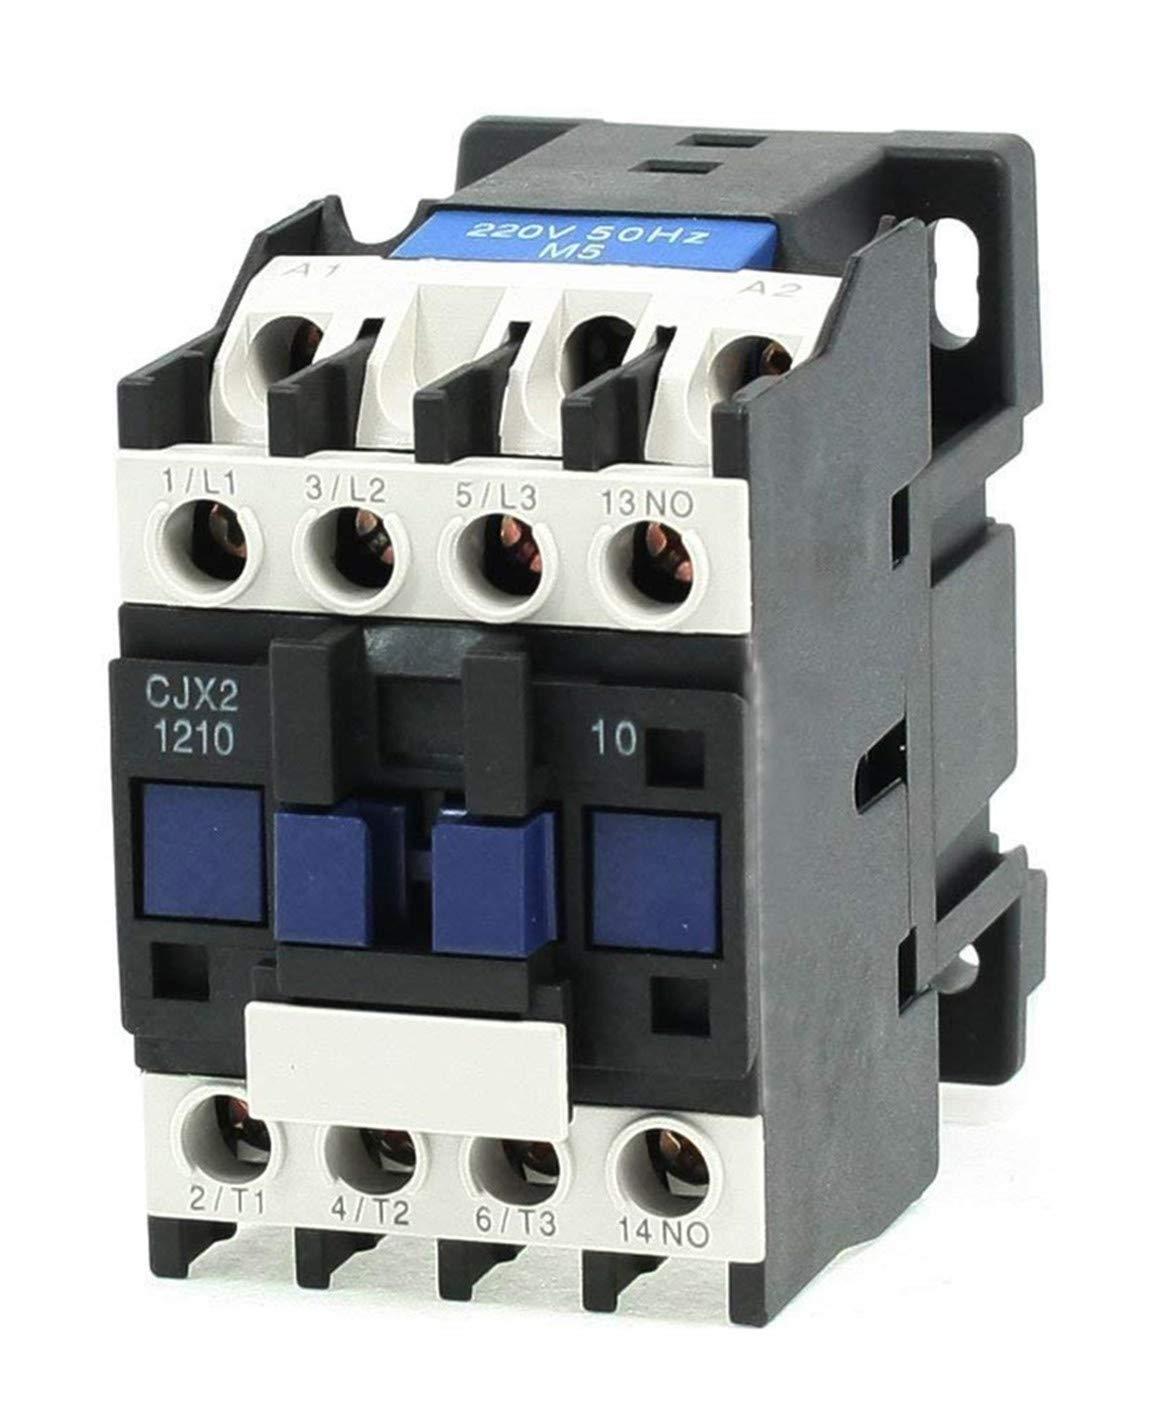 CJX2-1210 Motor Control 3 Poles One NO AC Contactor